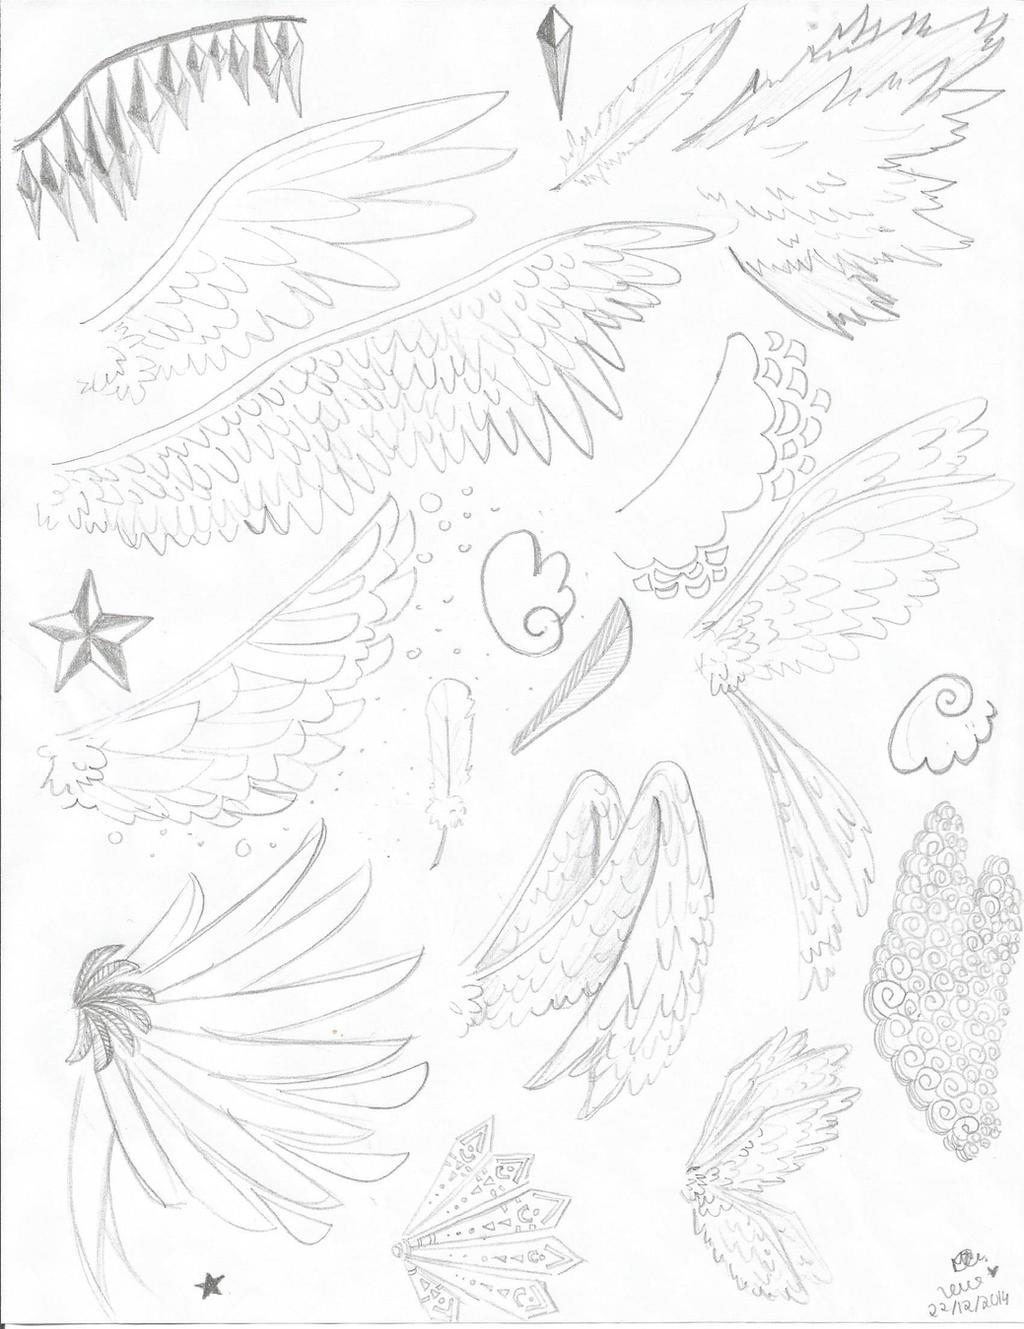 Angel's wings sketch by lenaS2anime on DeviantArt